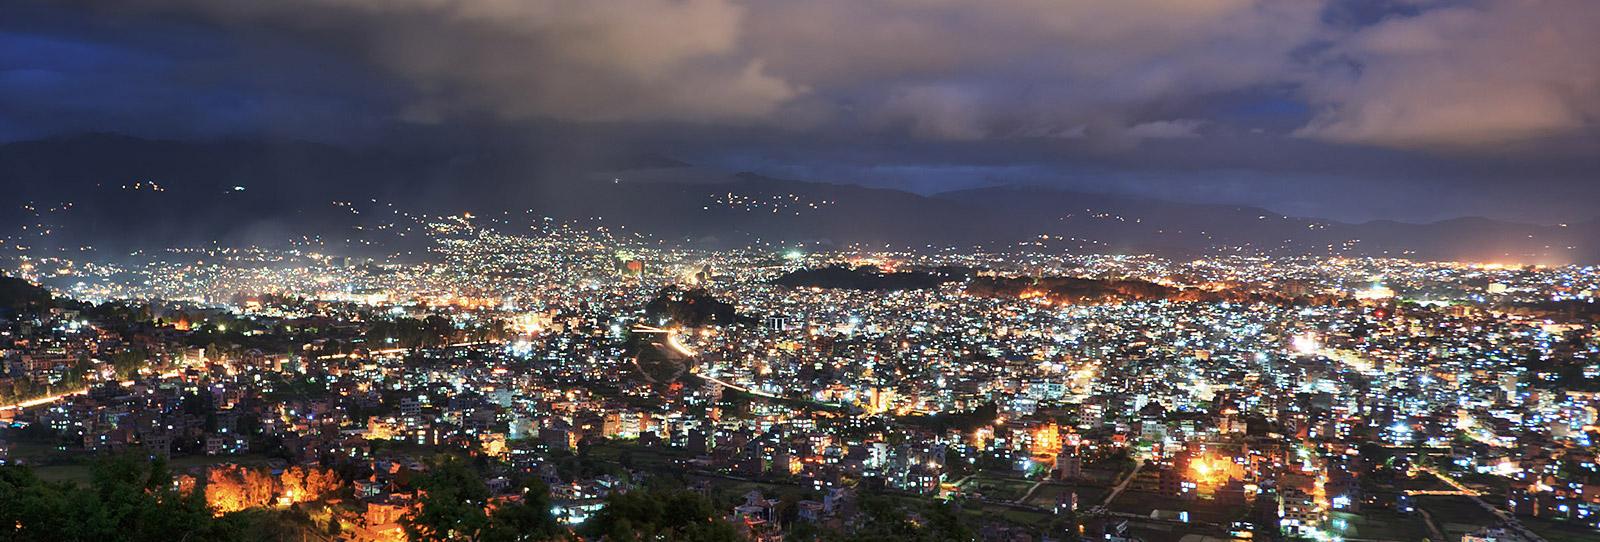 Places To See In Kathmandu Valley | Attractions In Kathmandu Valley